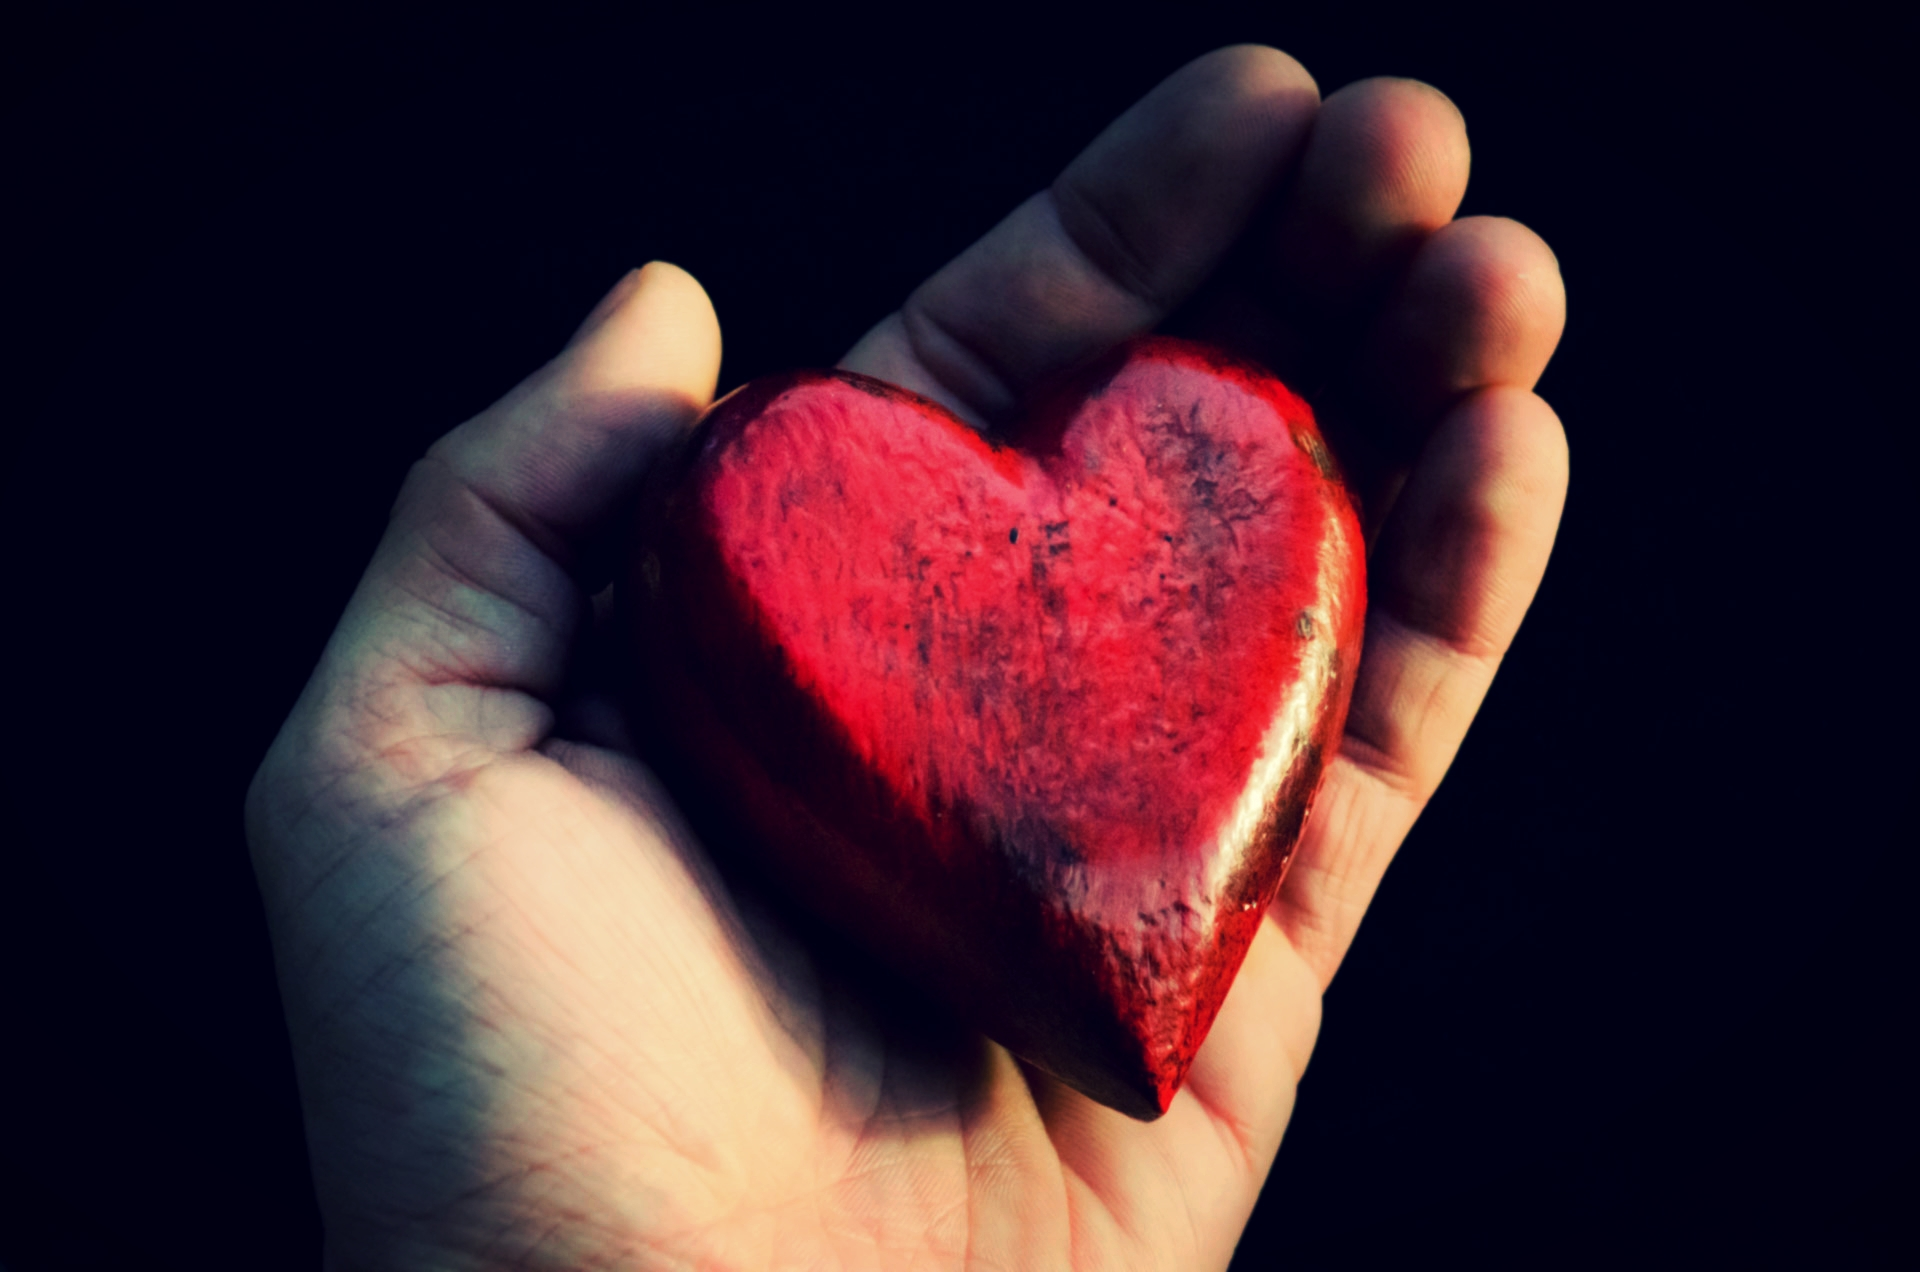 red-heart-in-hands.jpg